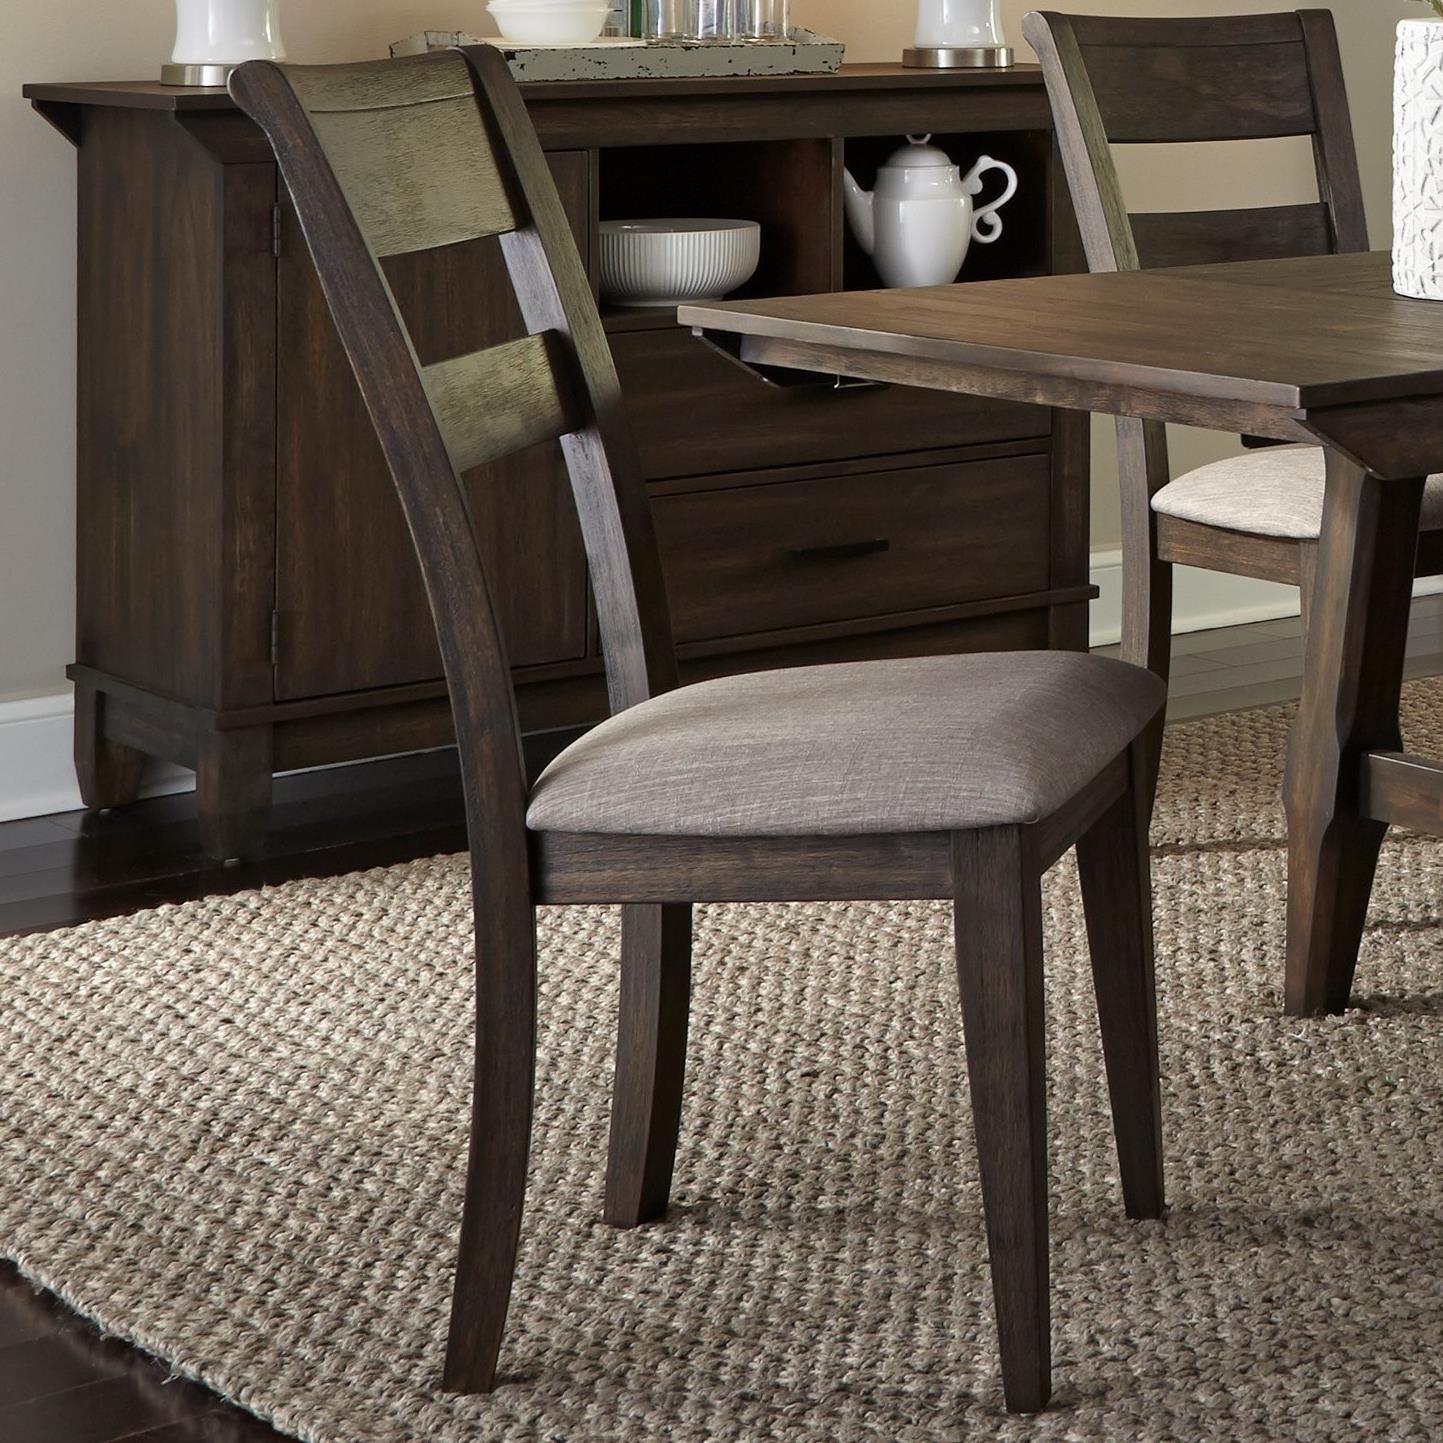 Liberty Furniture Double Bridge Splat Back Side Chair - Item Number: 152-C2501S